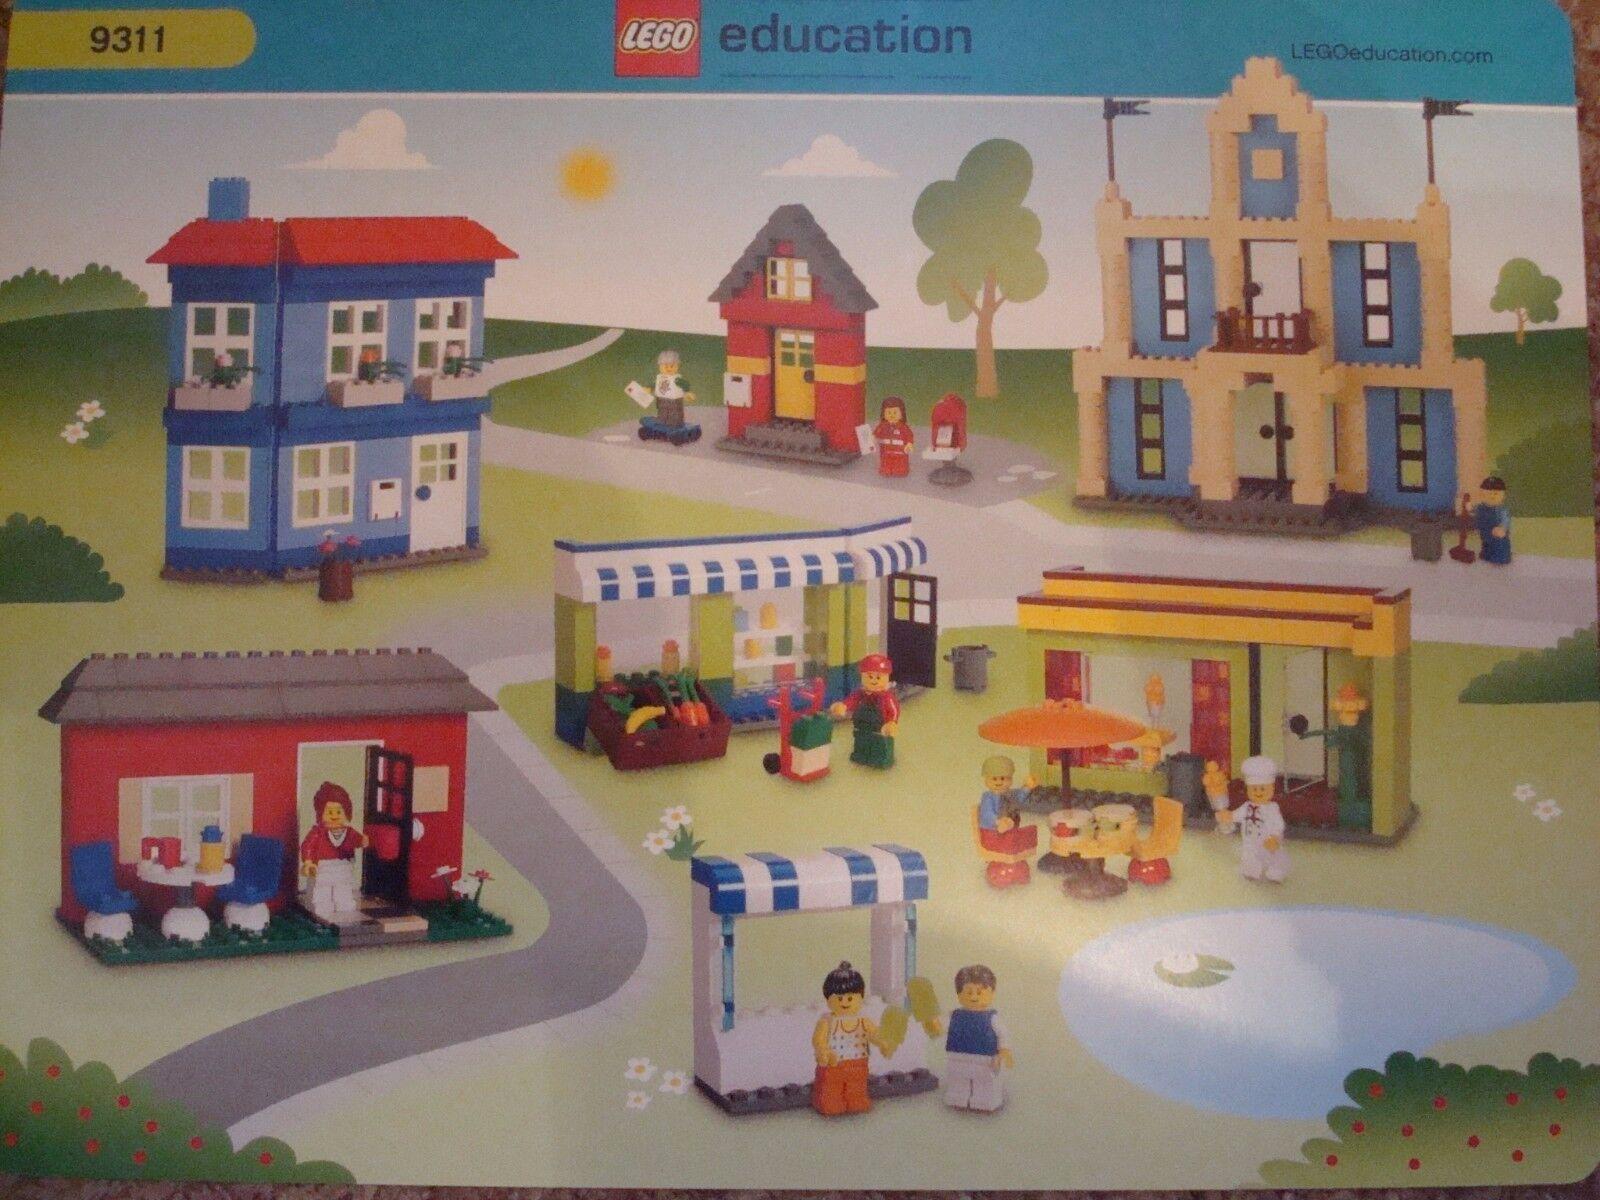 LEGO 9311 EDUCATION CITY BUILDING TUB VERY RARE RETIrot SET